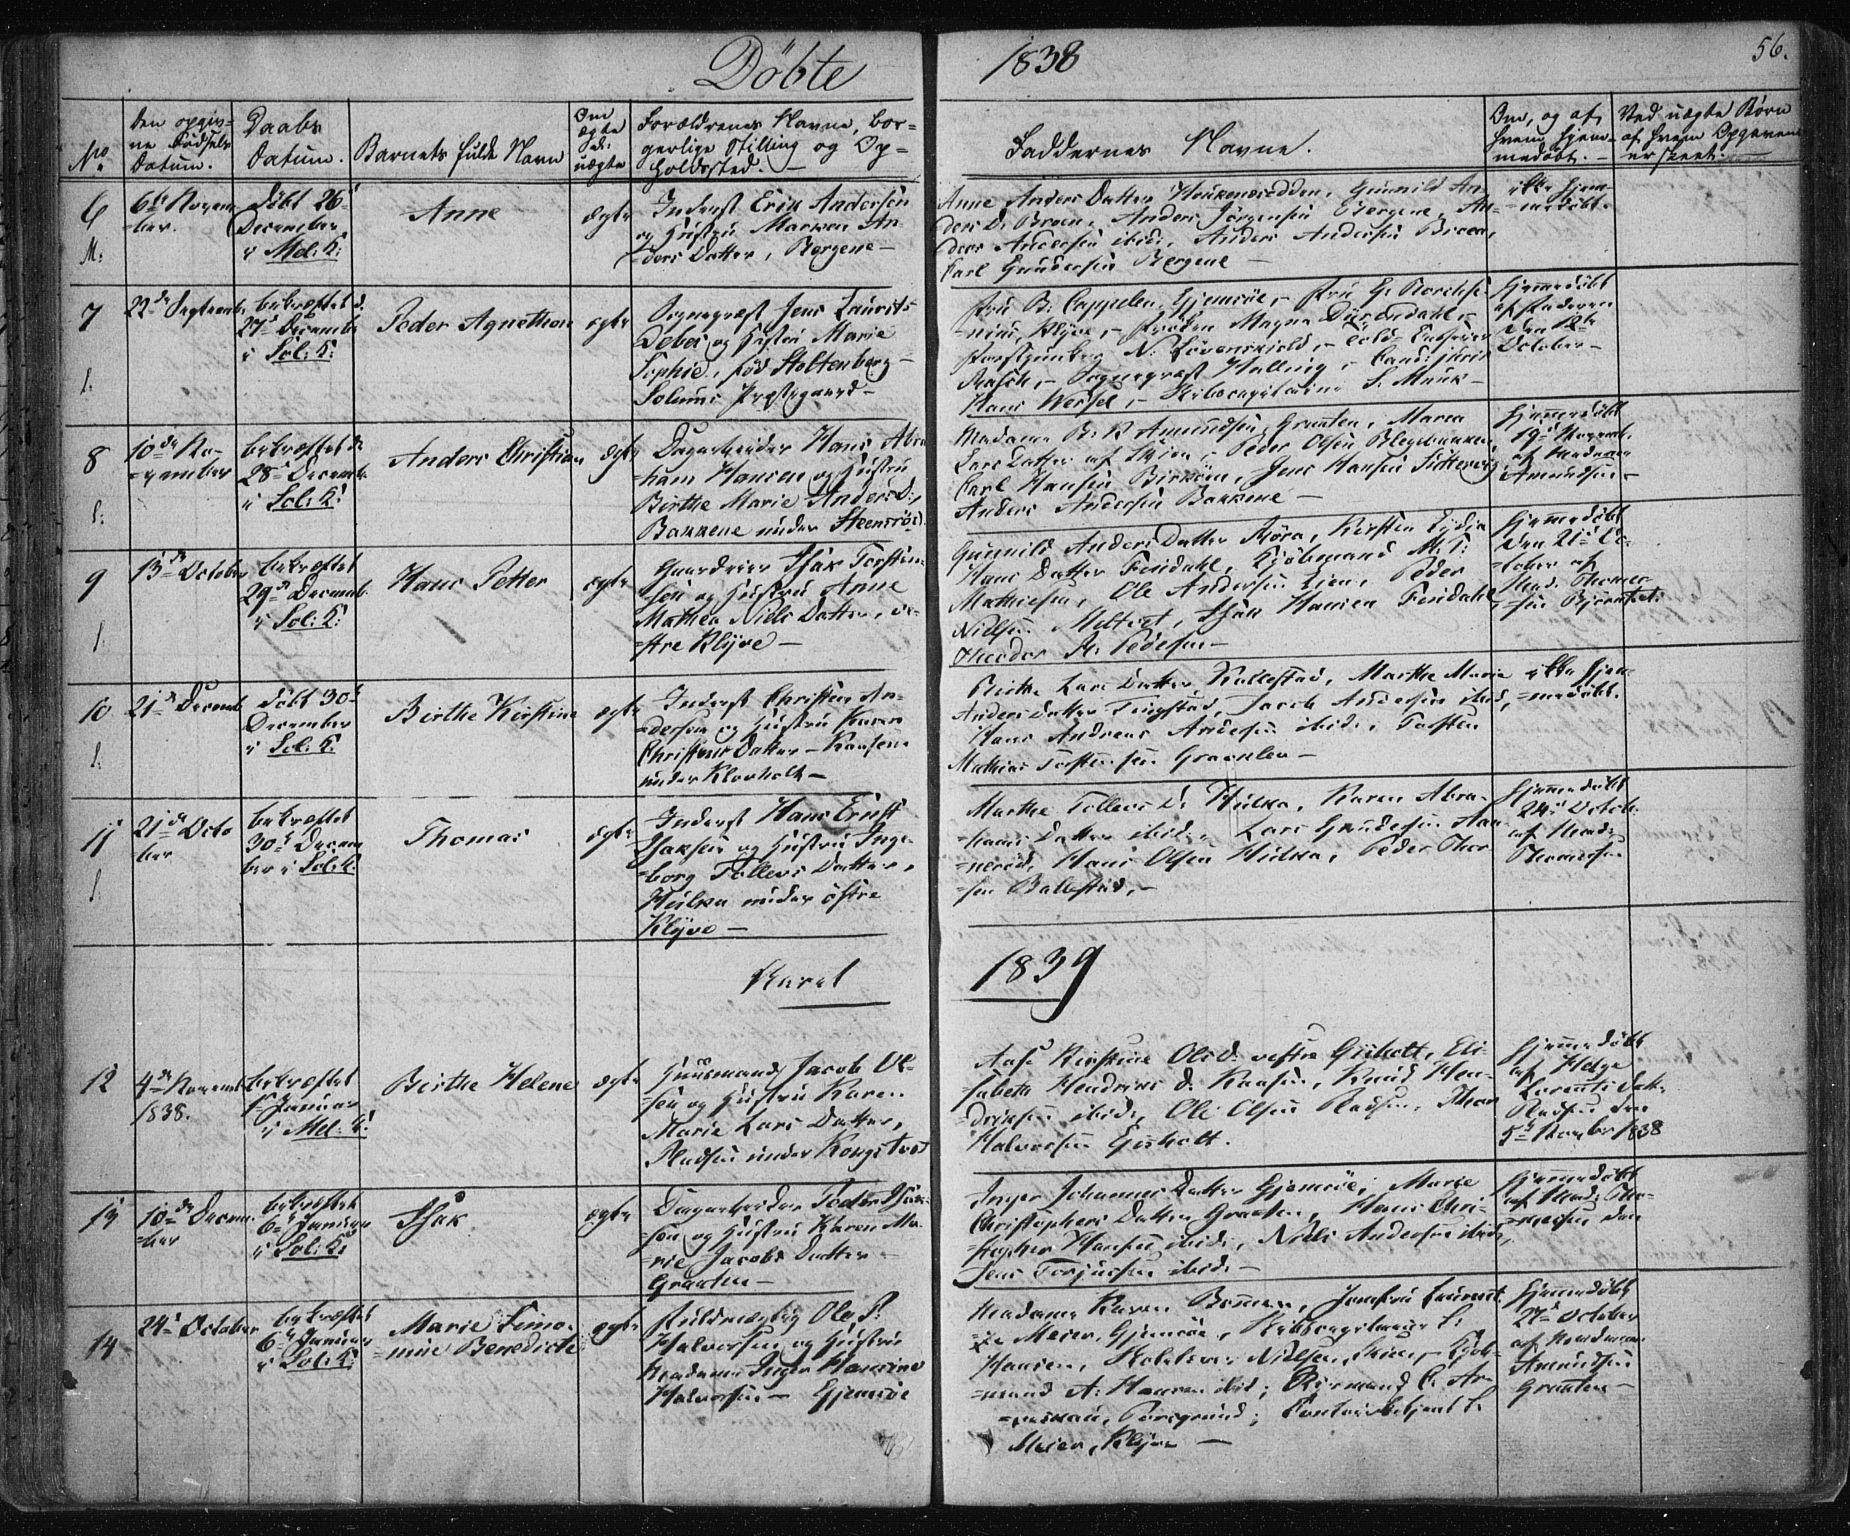 SAKO, Solum kirkebøker, F/Fa/L0005: Ministerialbok nr. I 5, 1833-1843, s. 56